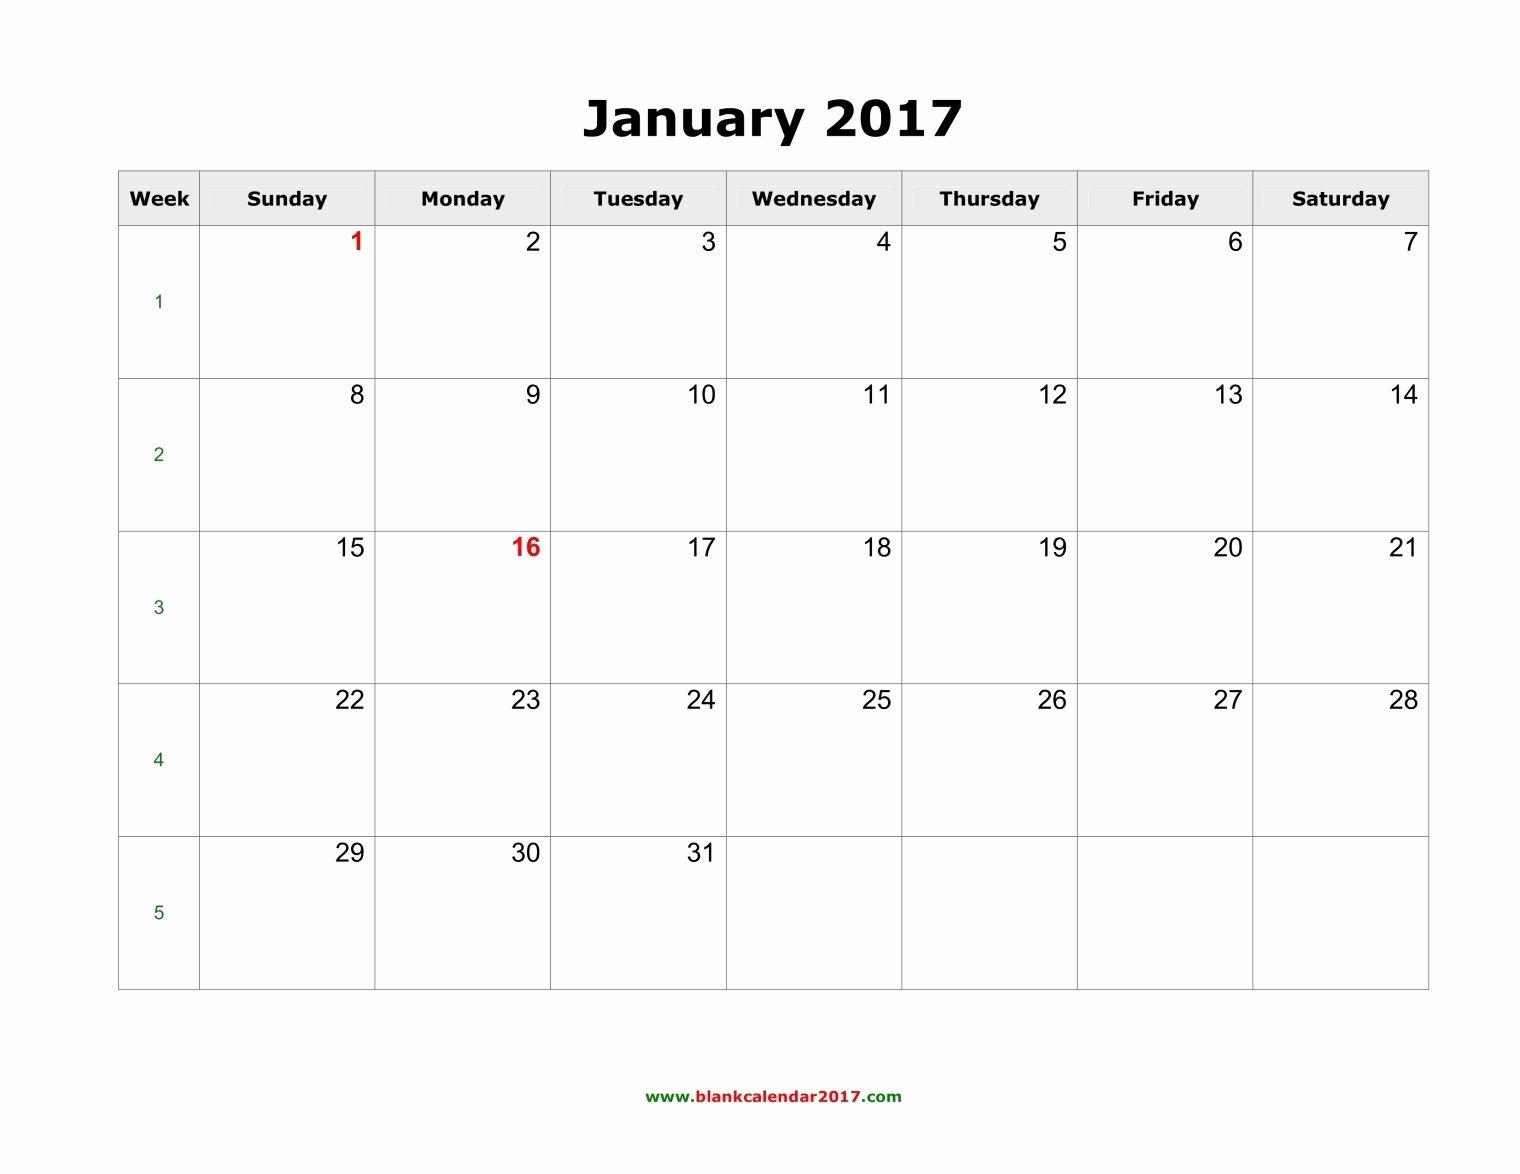 Free Yearly Calendar 2017 Awesome Blank Calendar January 2017 Landscape